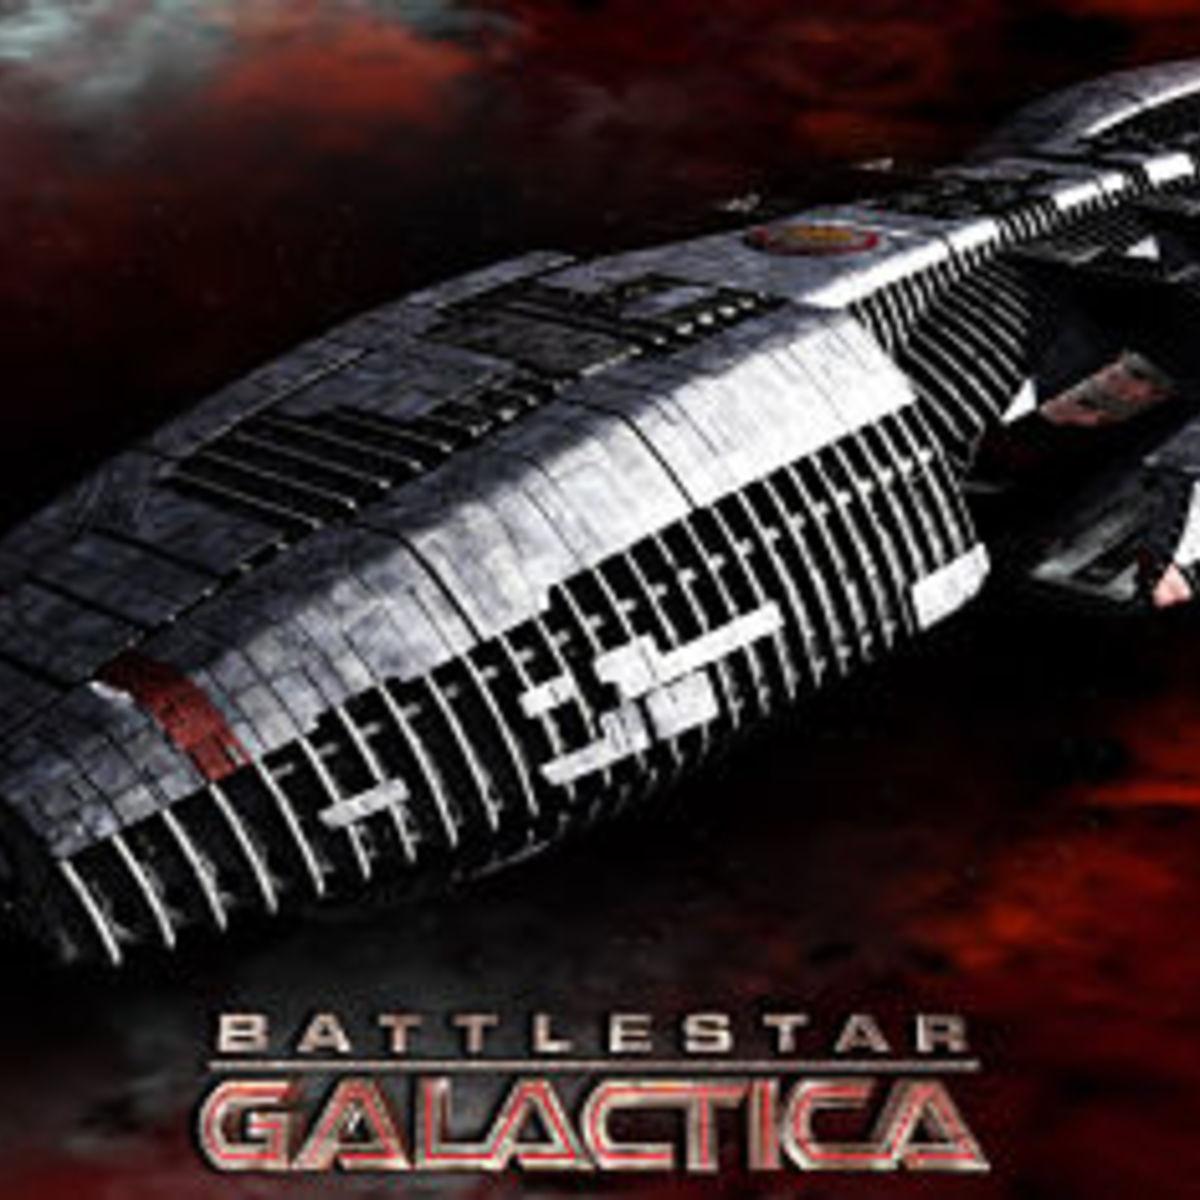 battlestar-galactica_opt.jpg